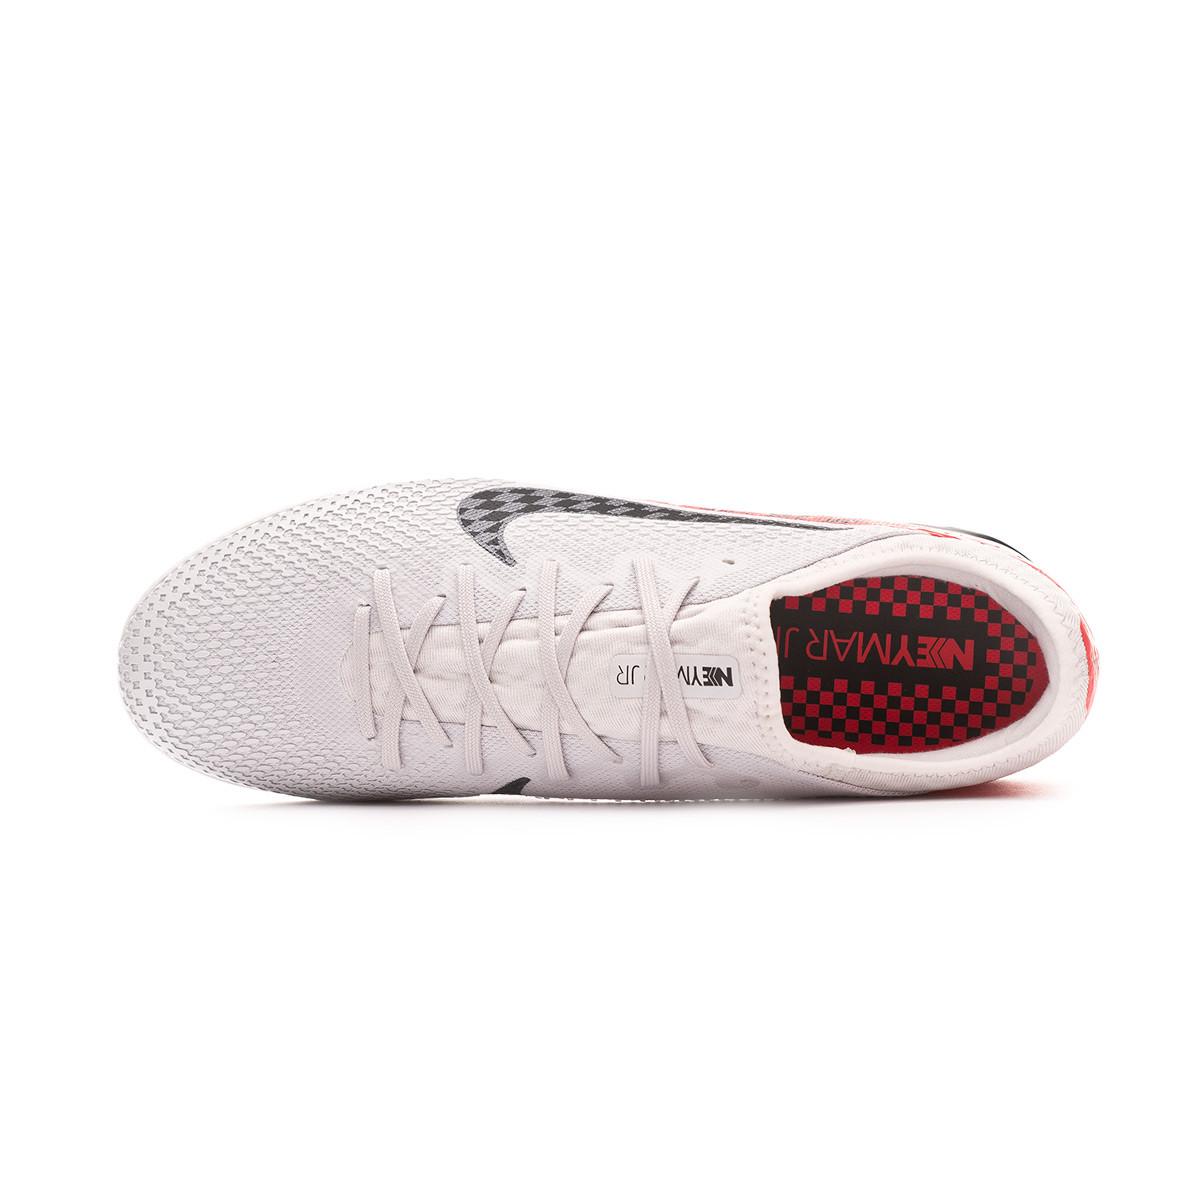 Sapatilha de Futsal Nike Mercurial Vapor XIII Pro IC Neymar Jr